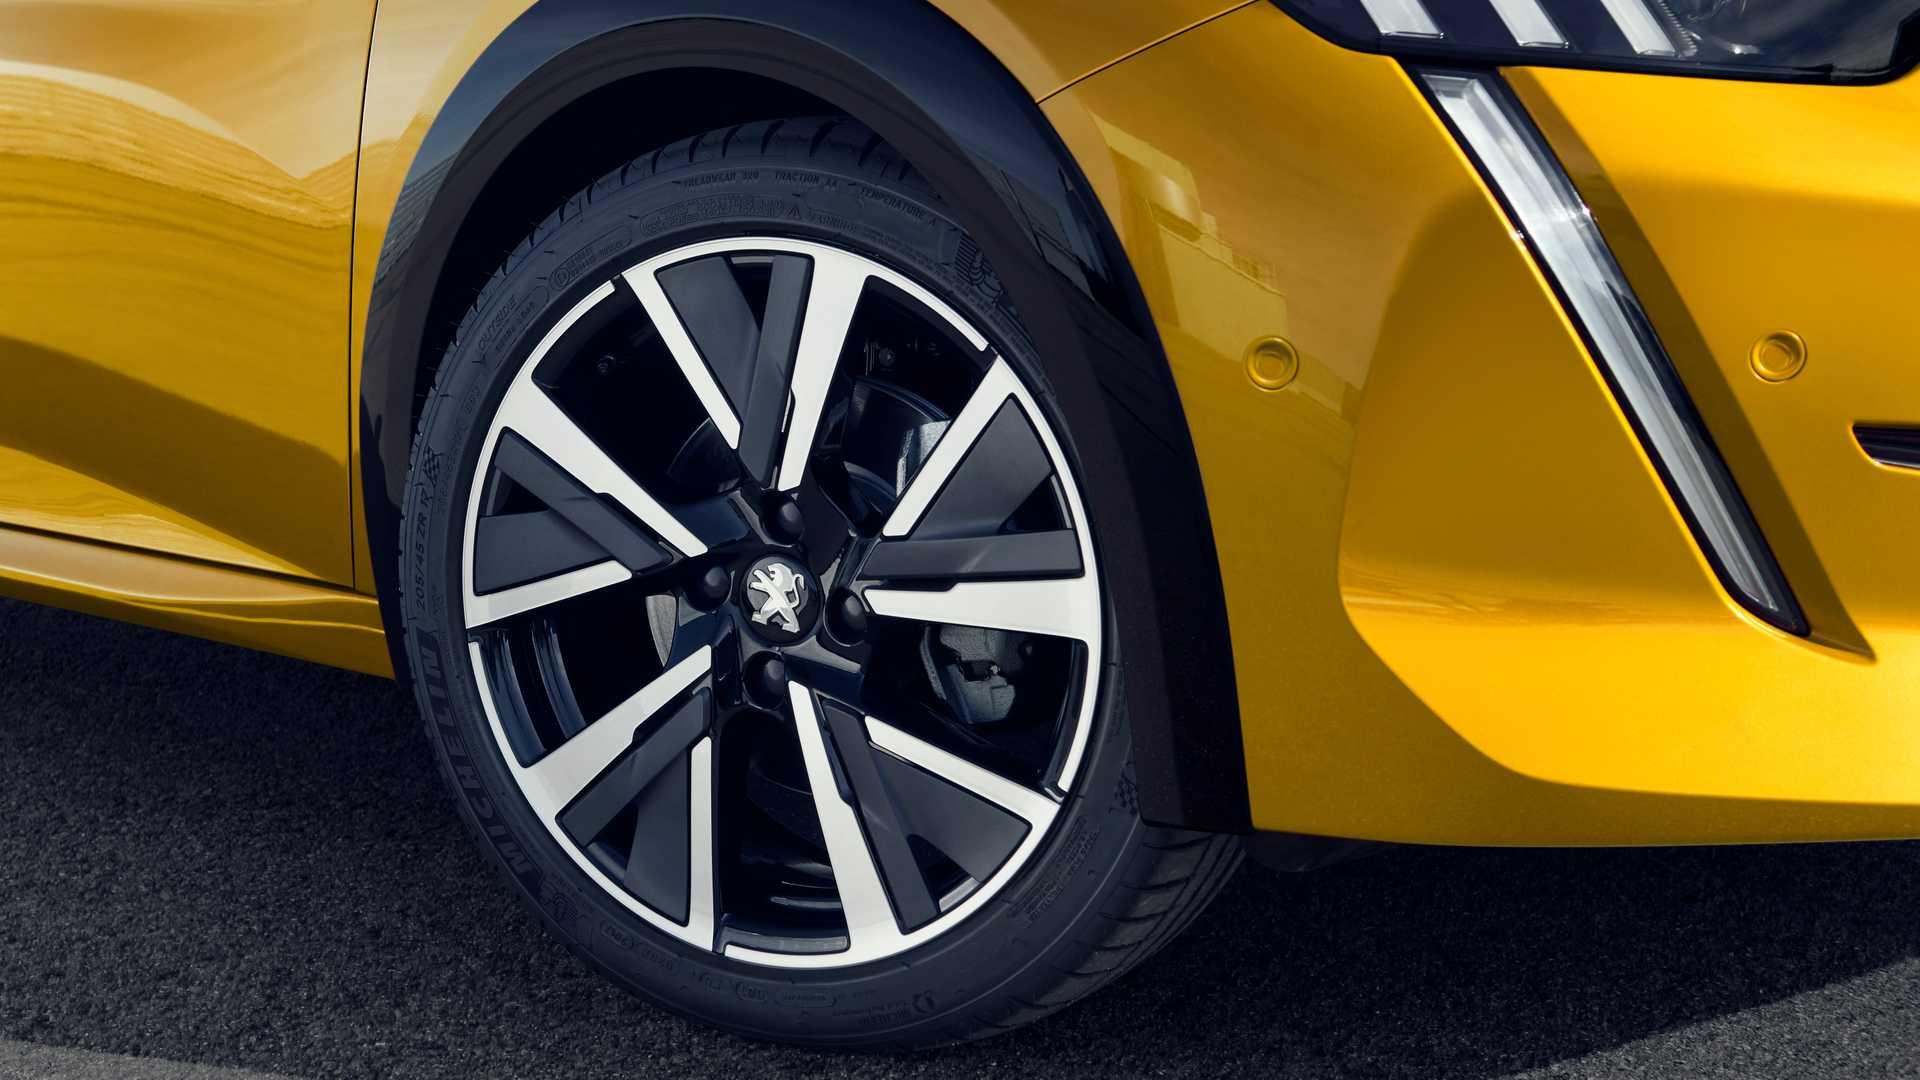 2020 Peugeot 208 Wheel Wallpapers (14)